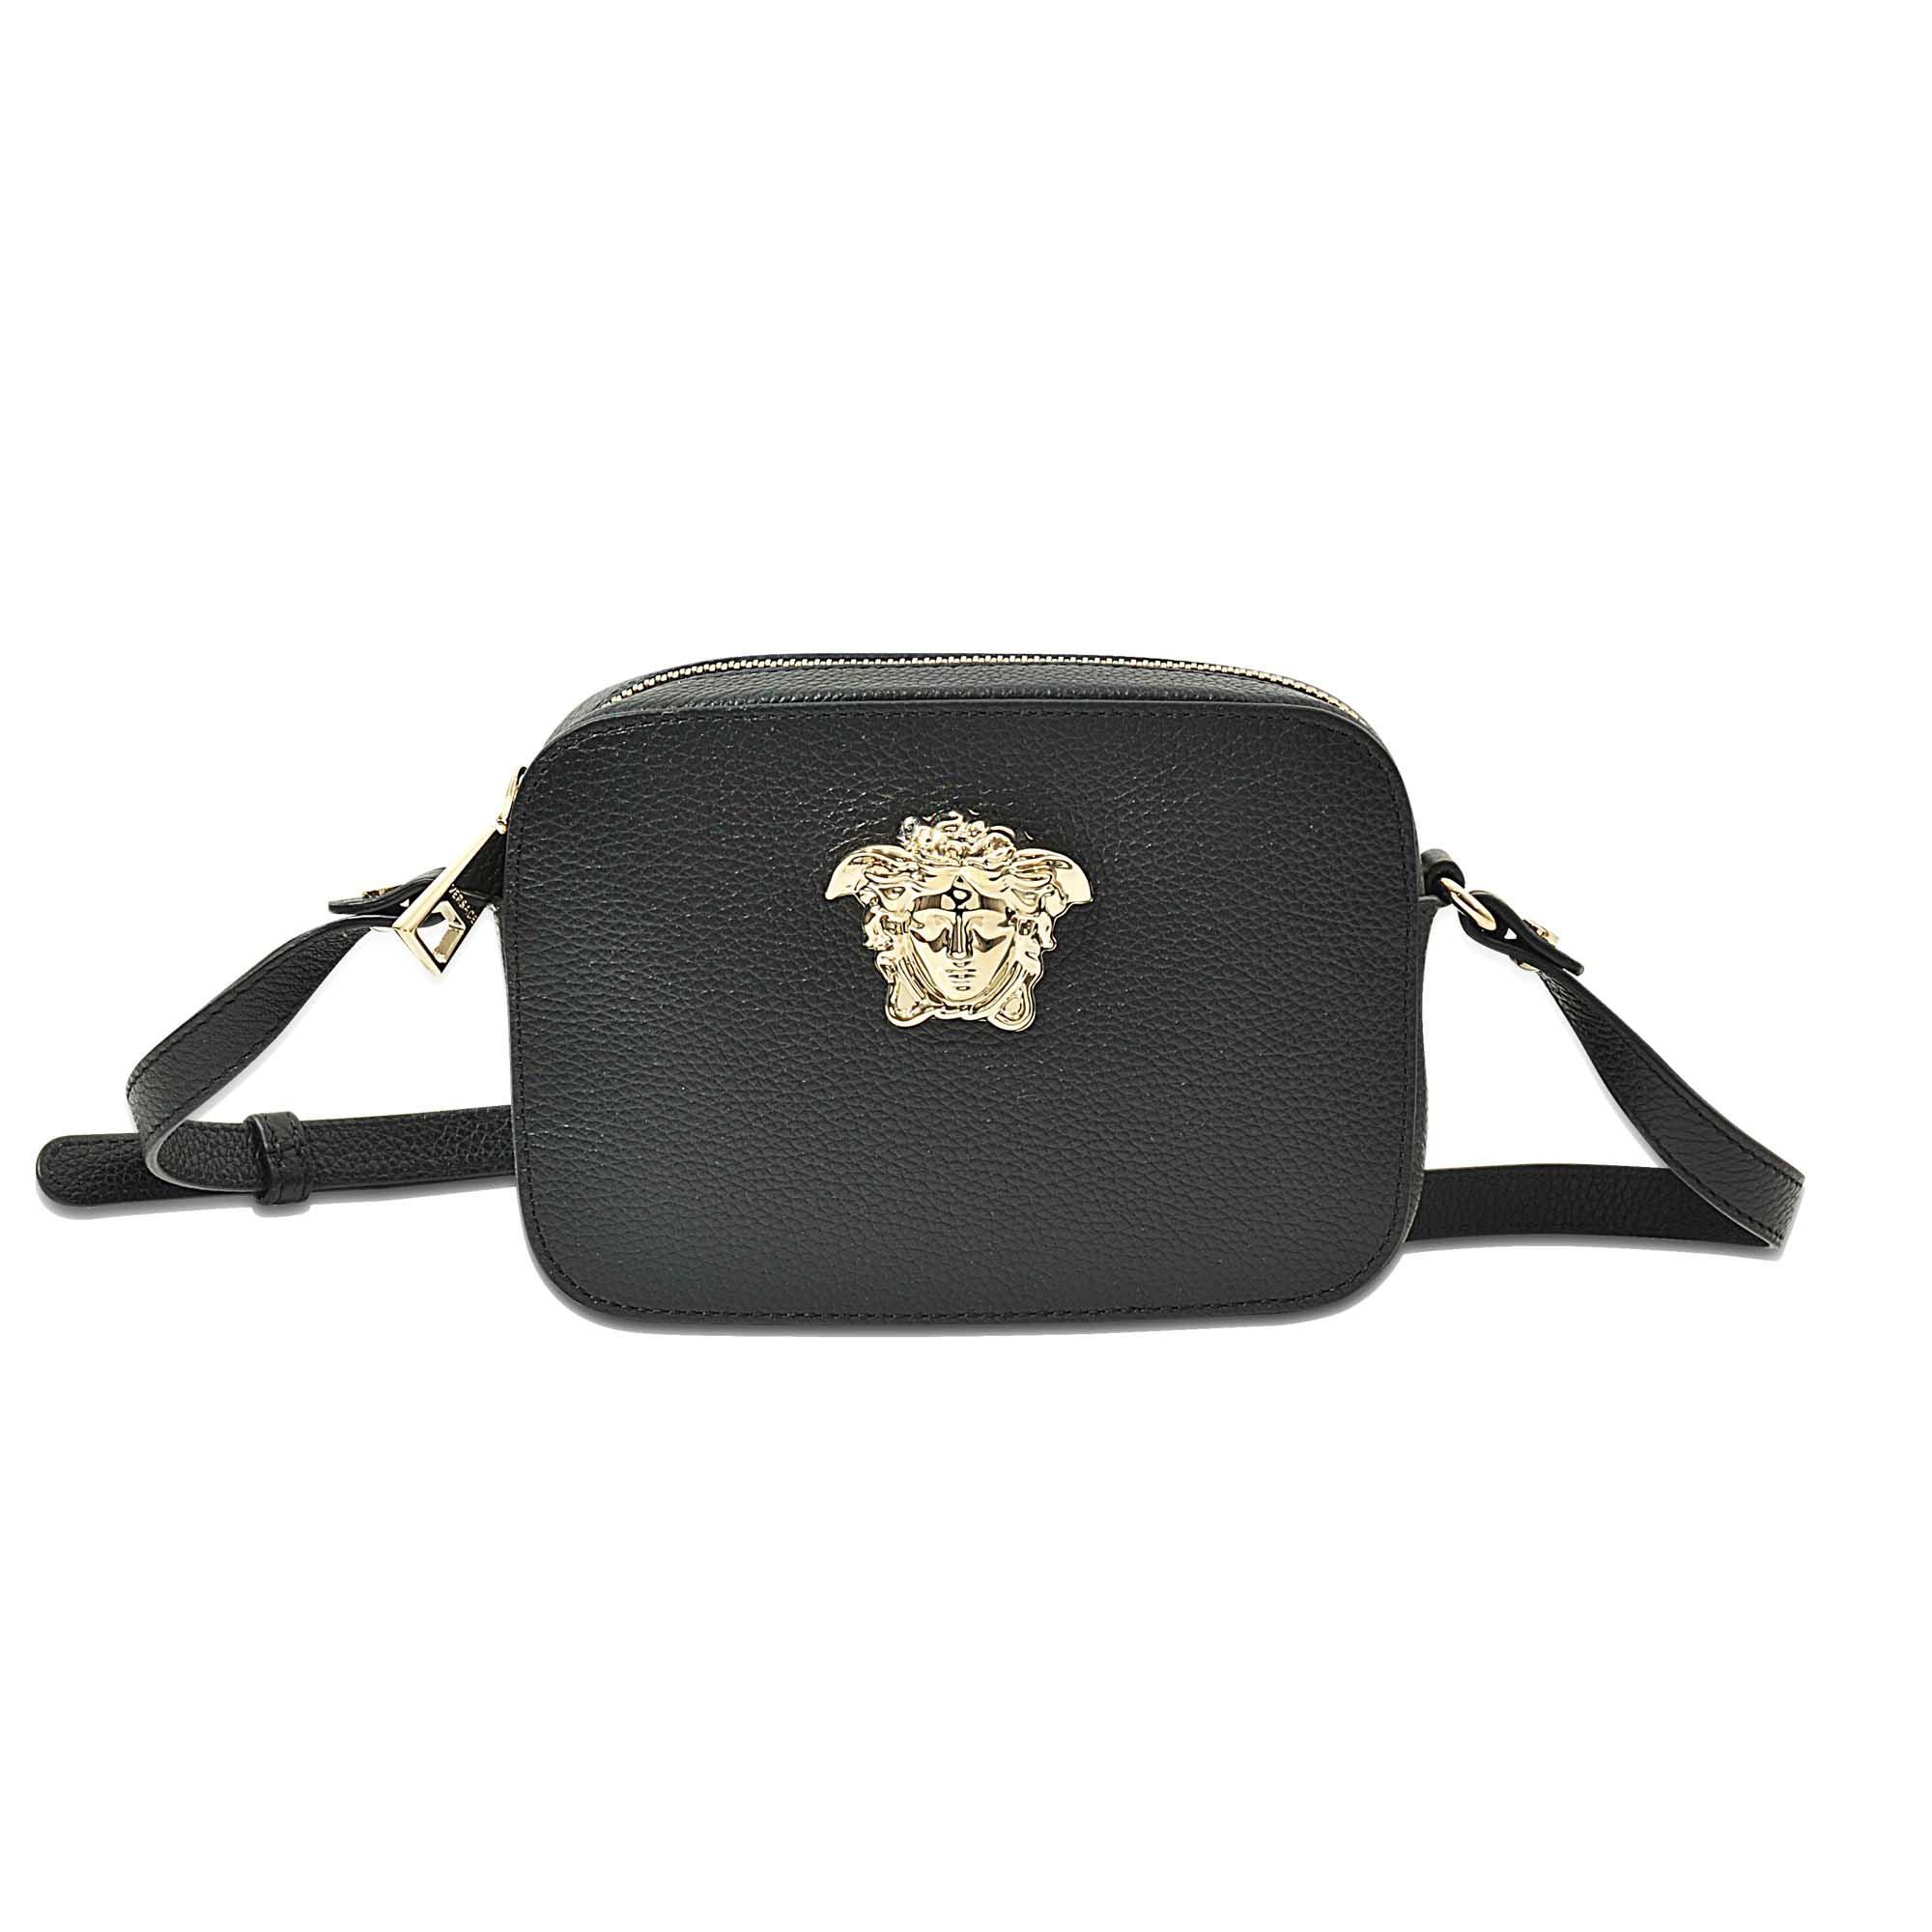 10c473dd56e0 Versace Camera Pouch in Black - Lyst